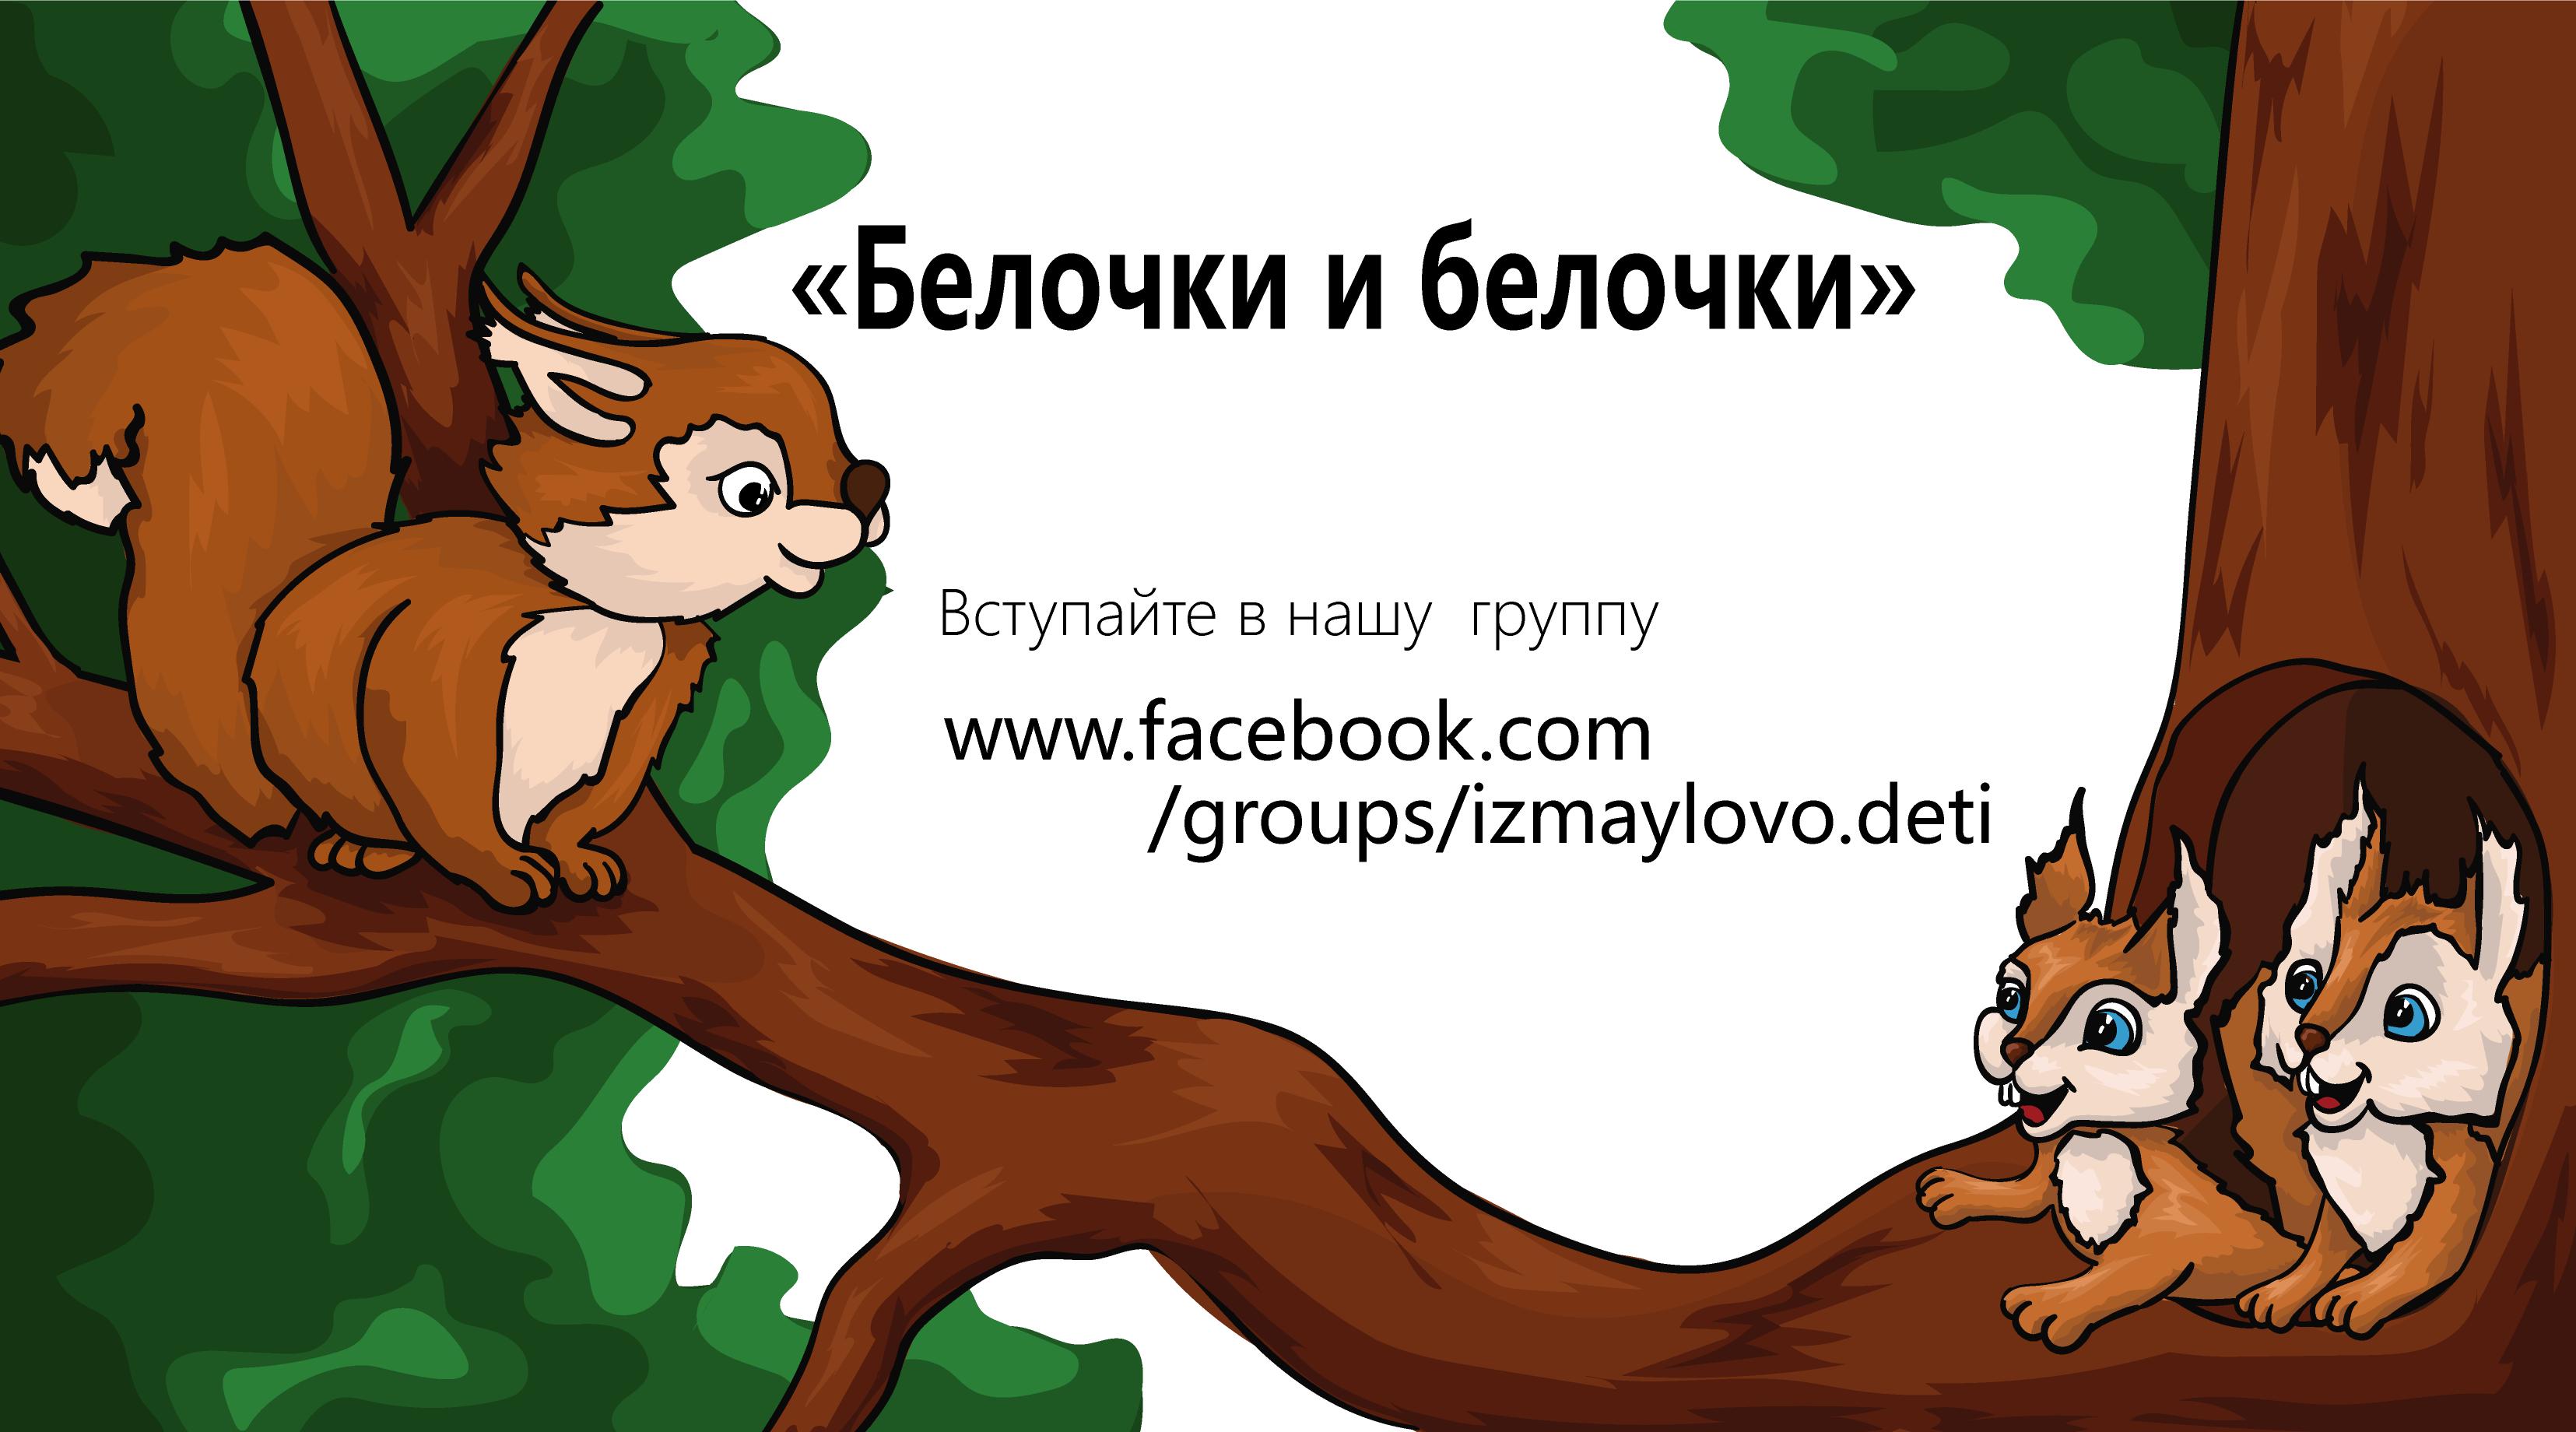 Конкурс на создание макета визиток сообщества мам (белочки). фото f_65559b547b8881bc.png